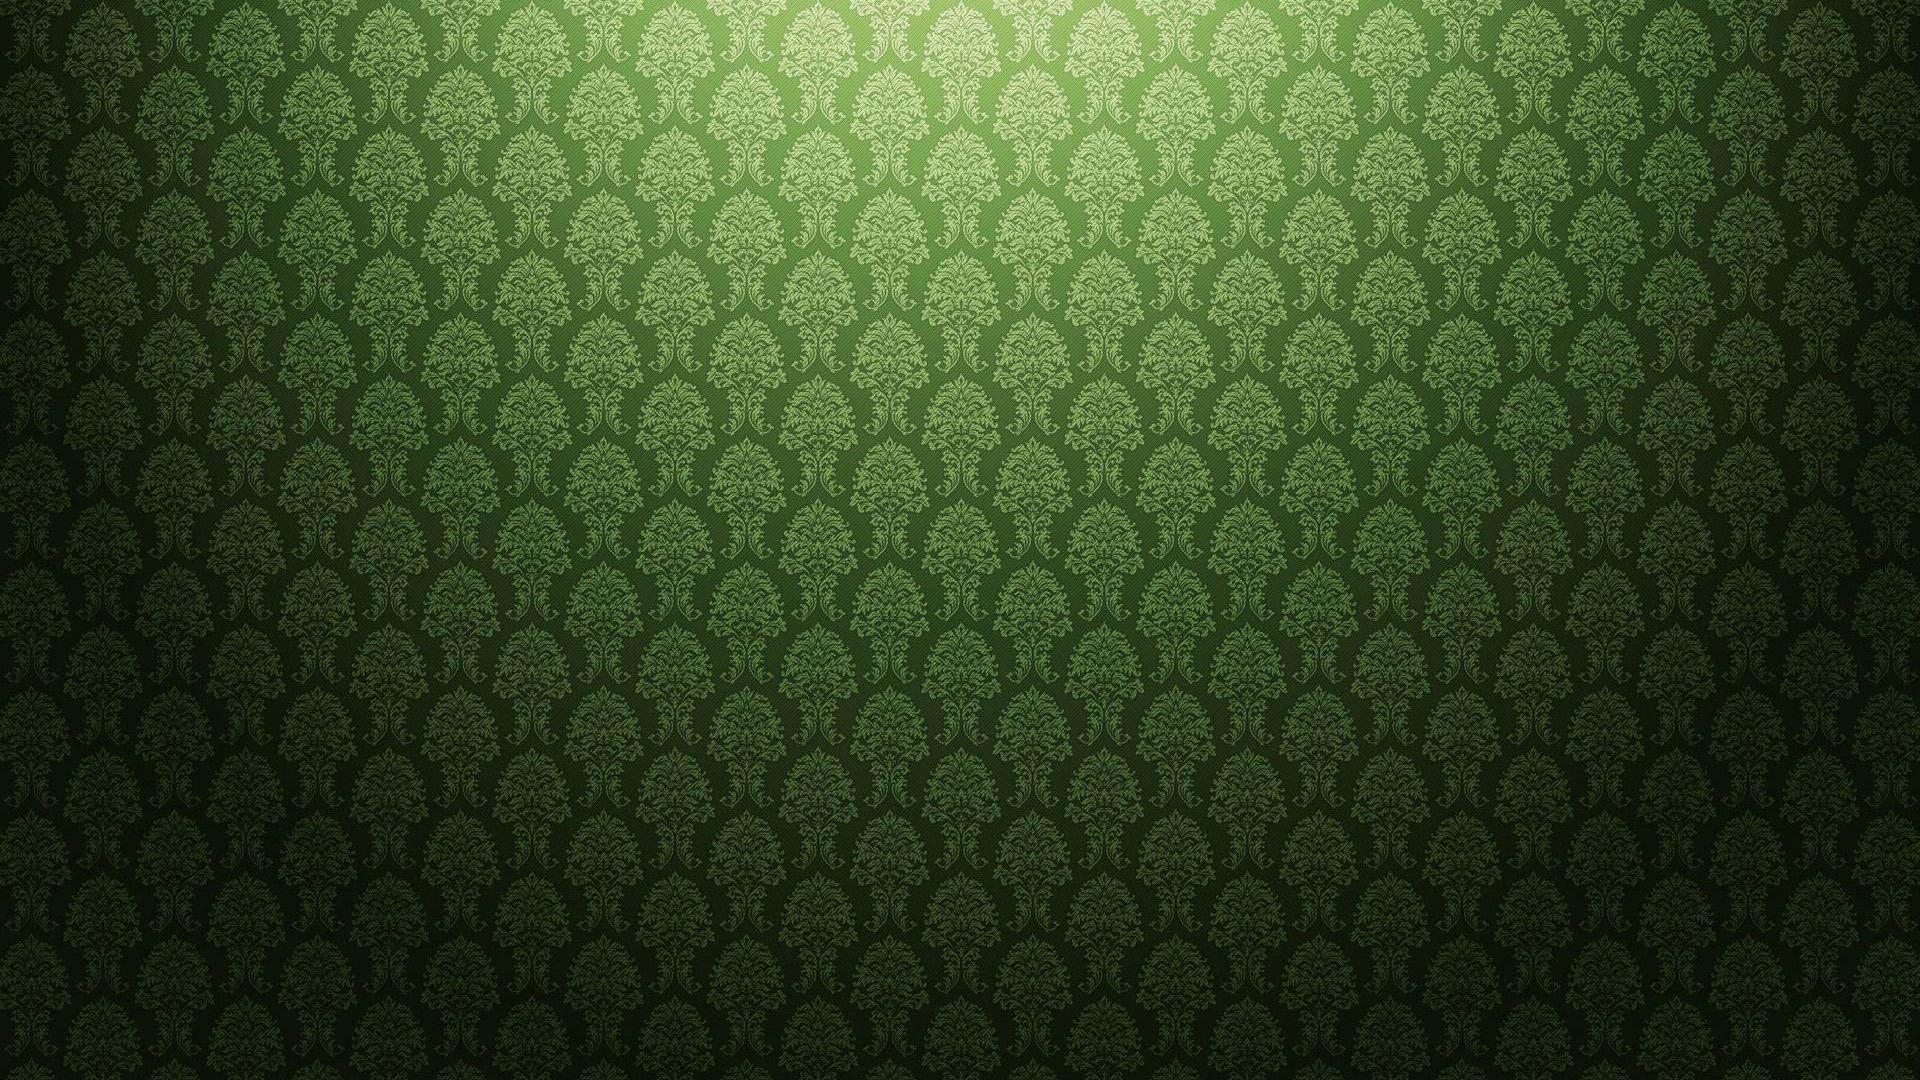 Green Floral Wallpaper on Number Lines